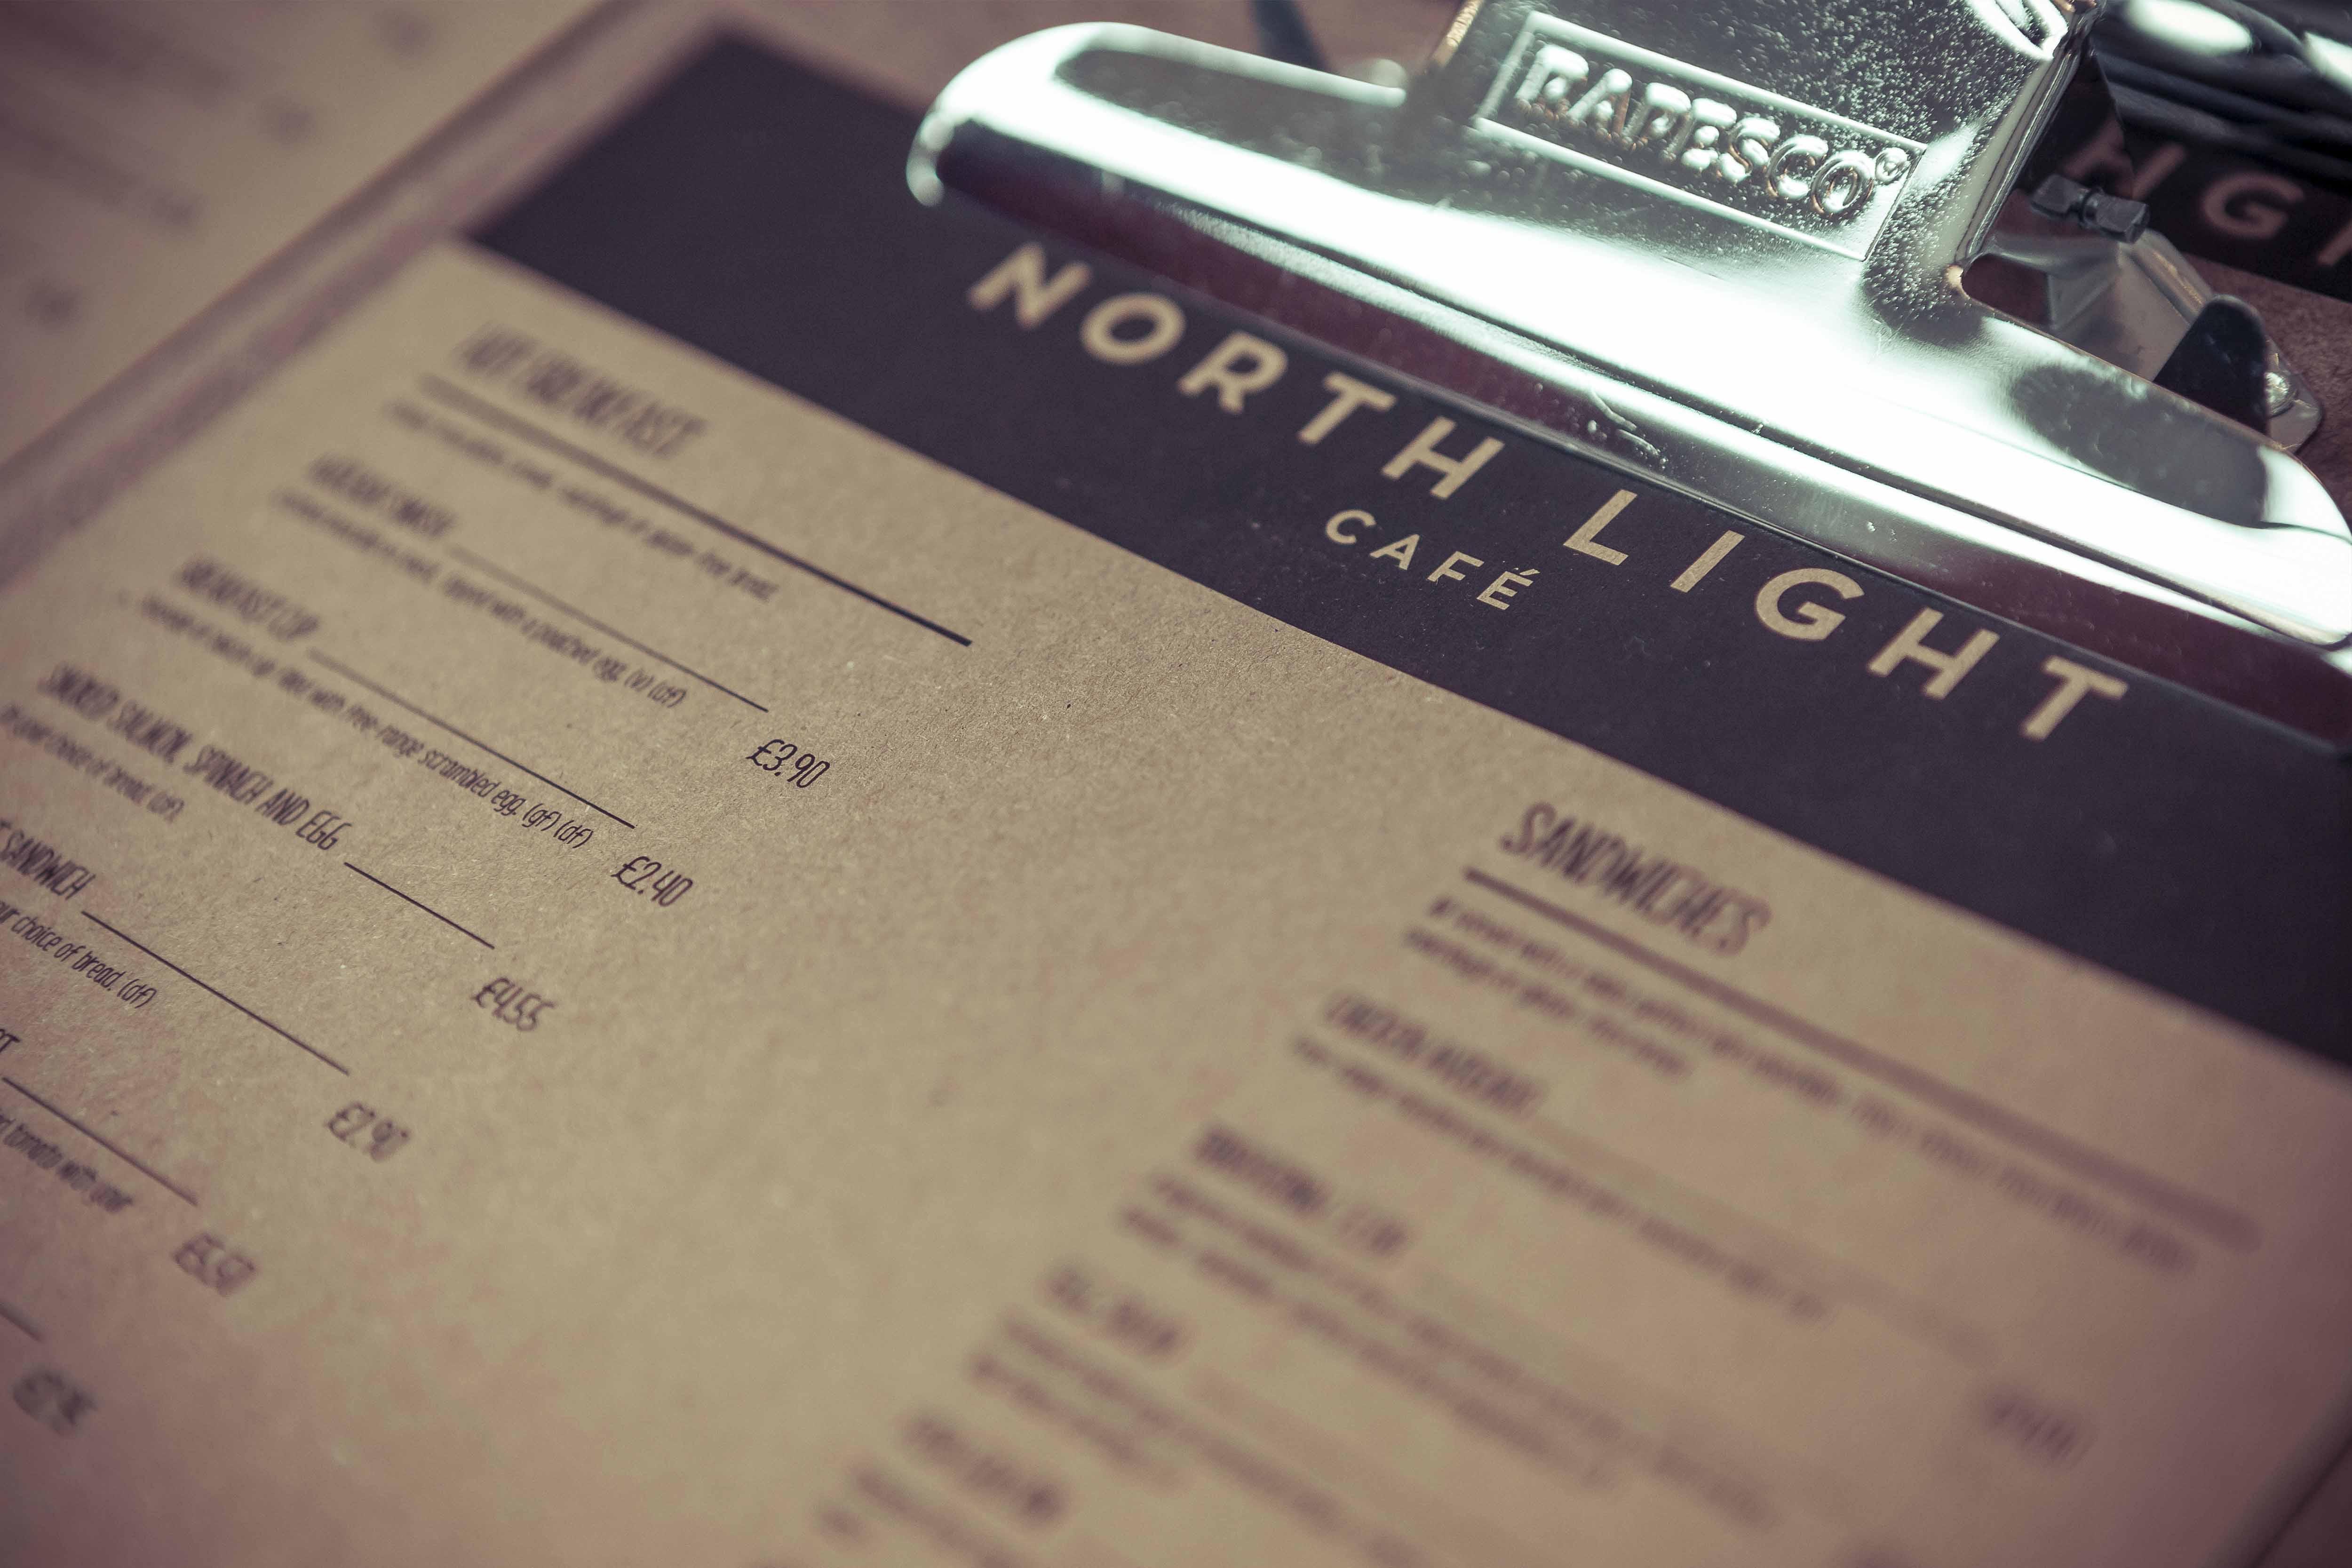 North Light Menu Design